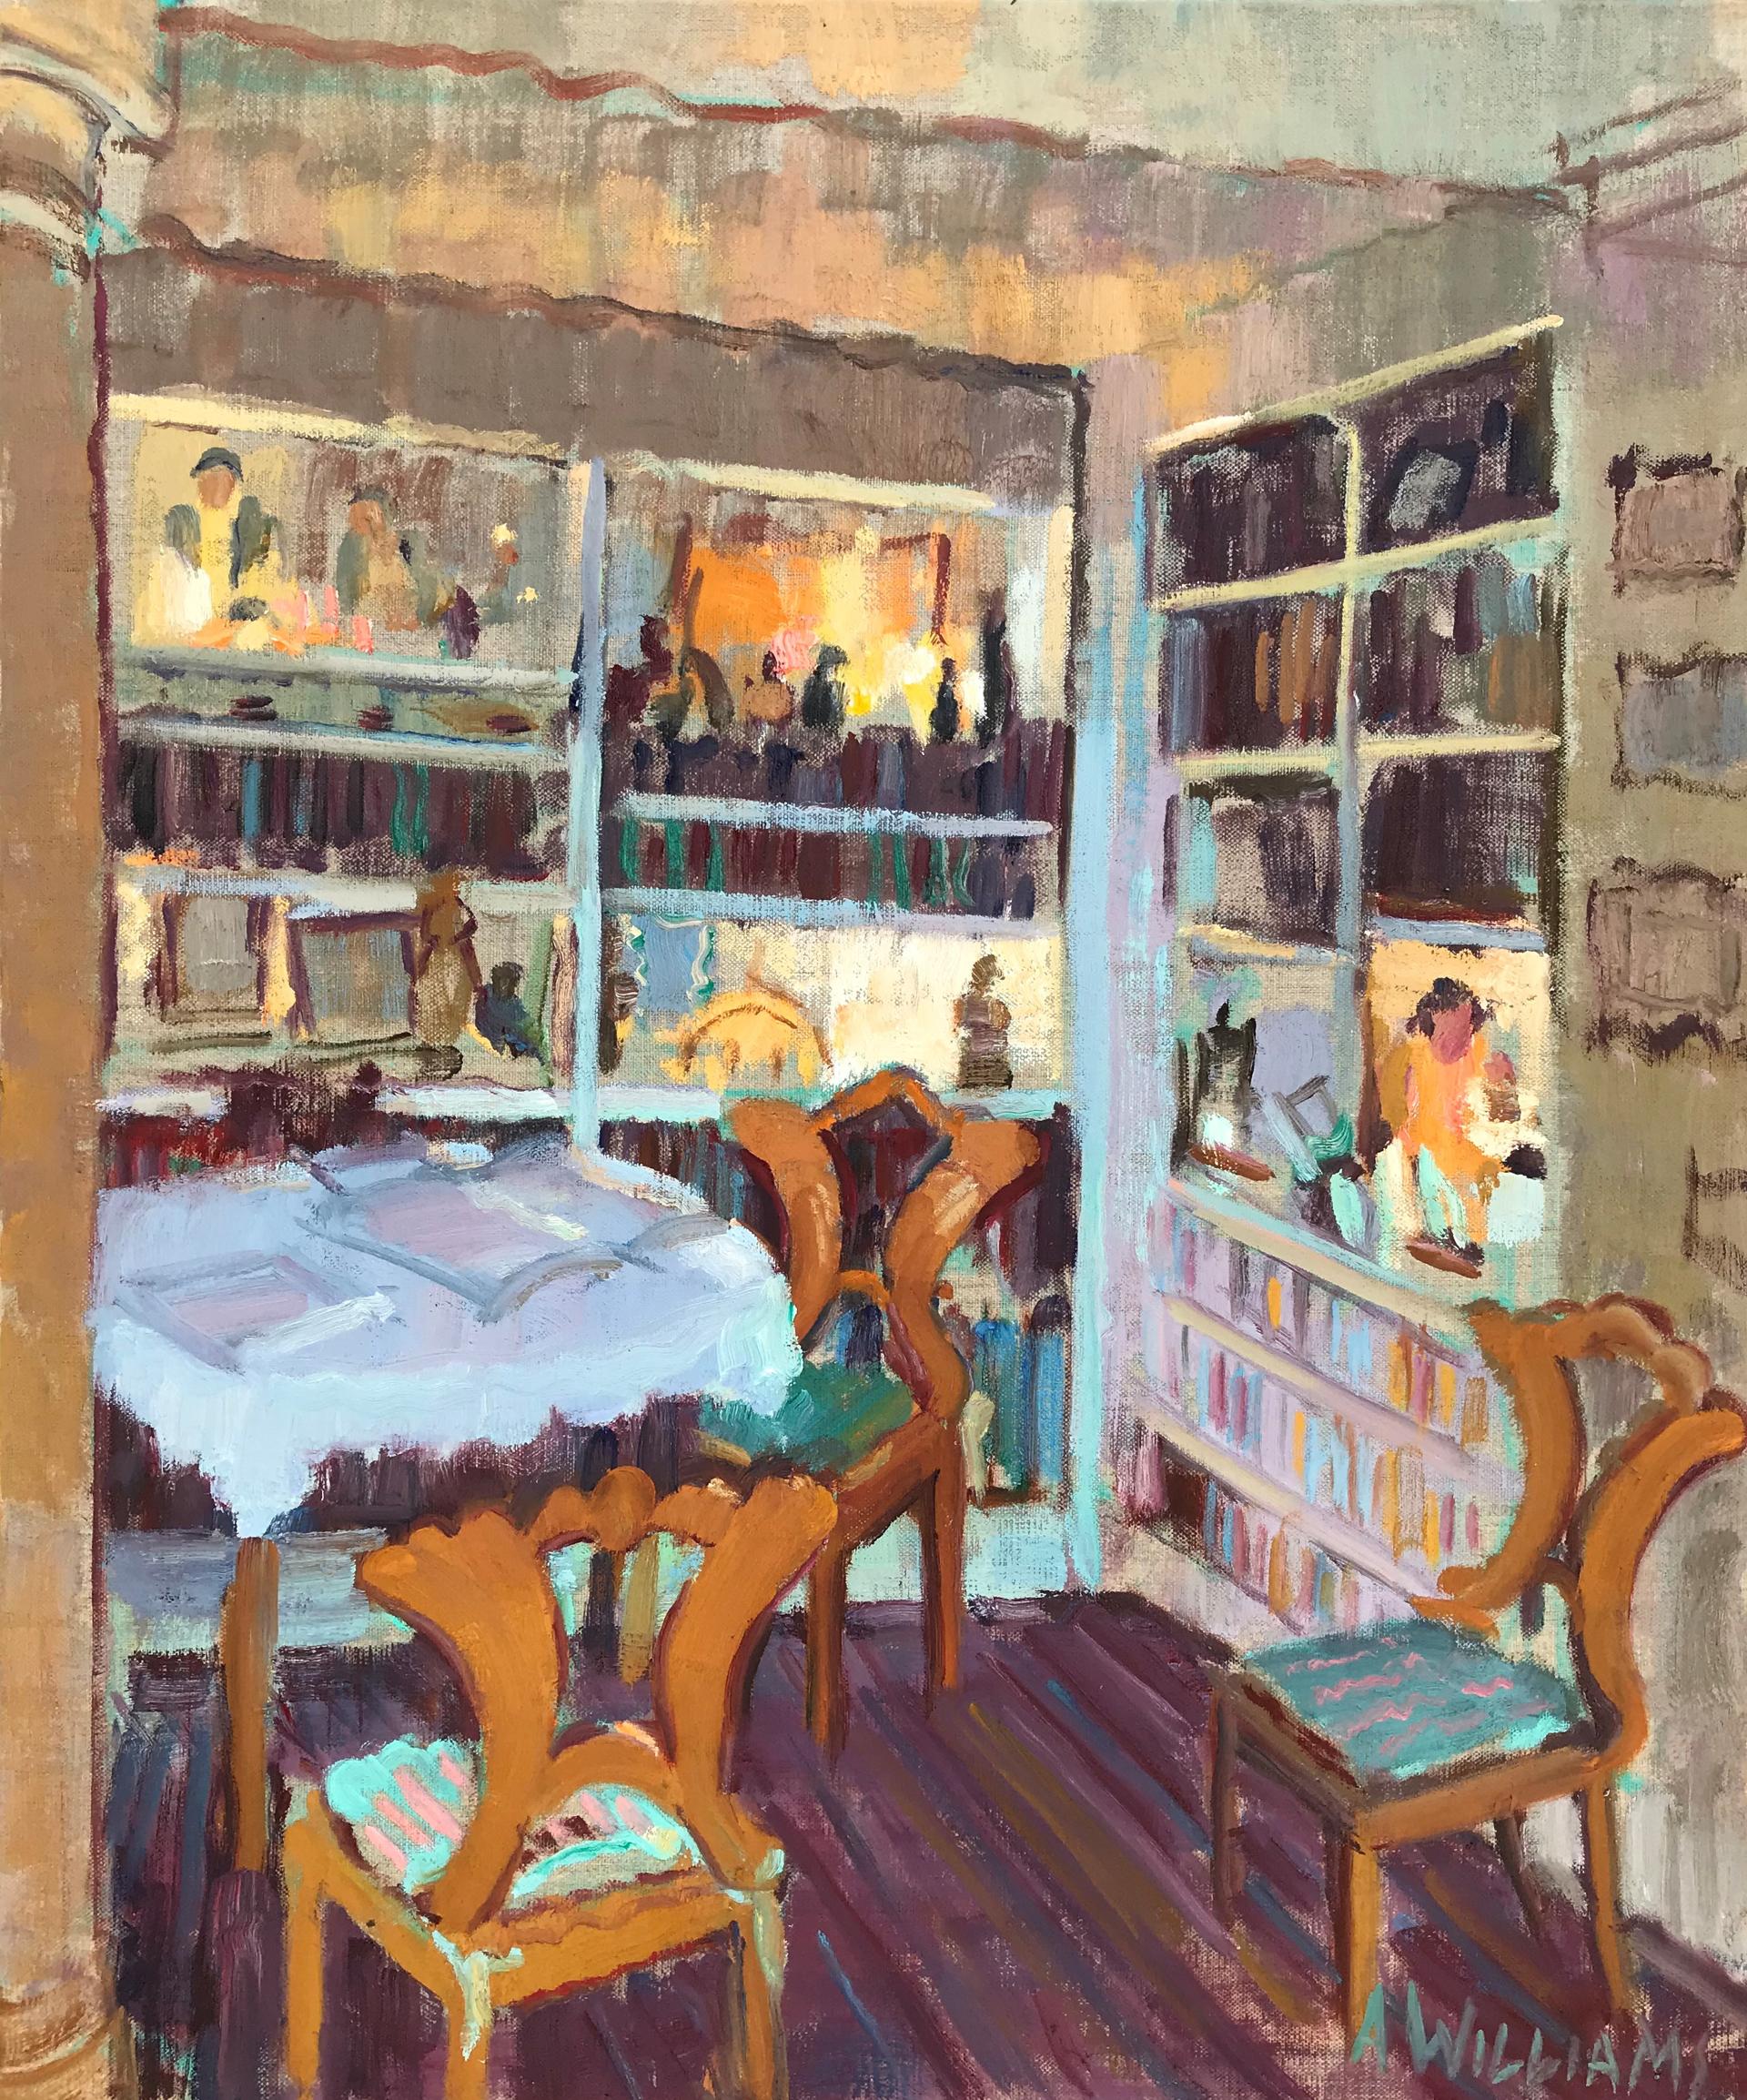 Bernadette's Reading Room by Alice Williams